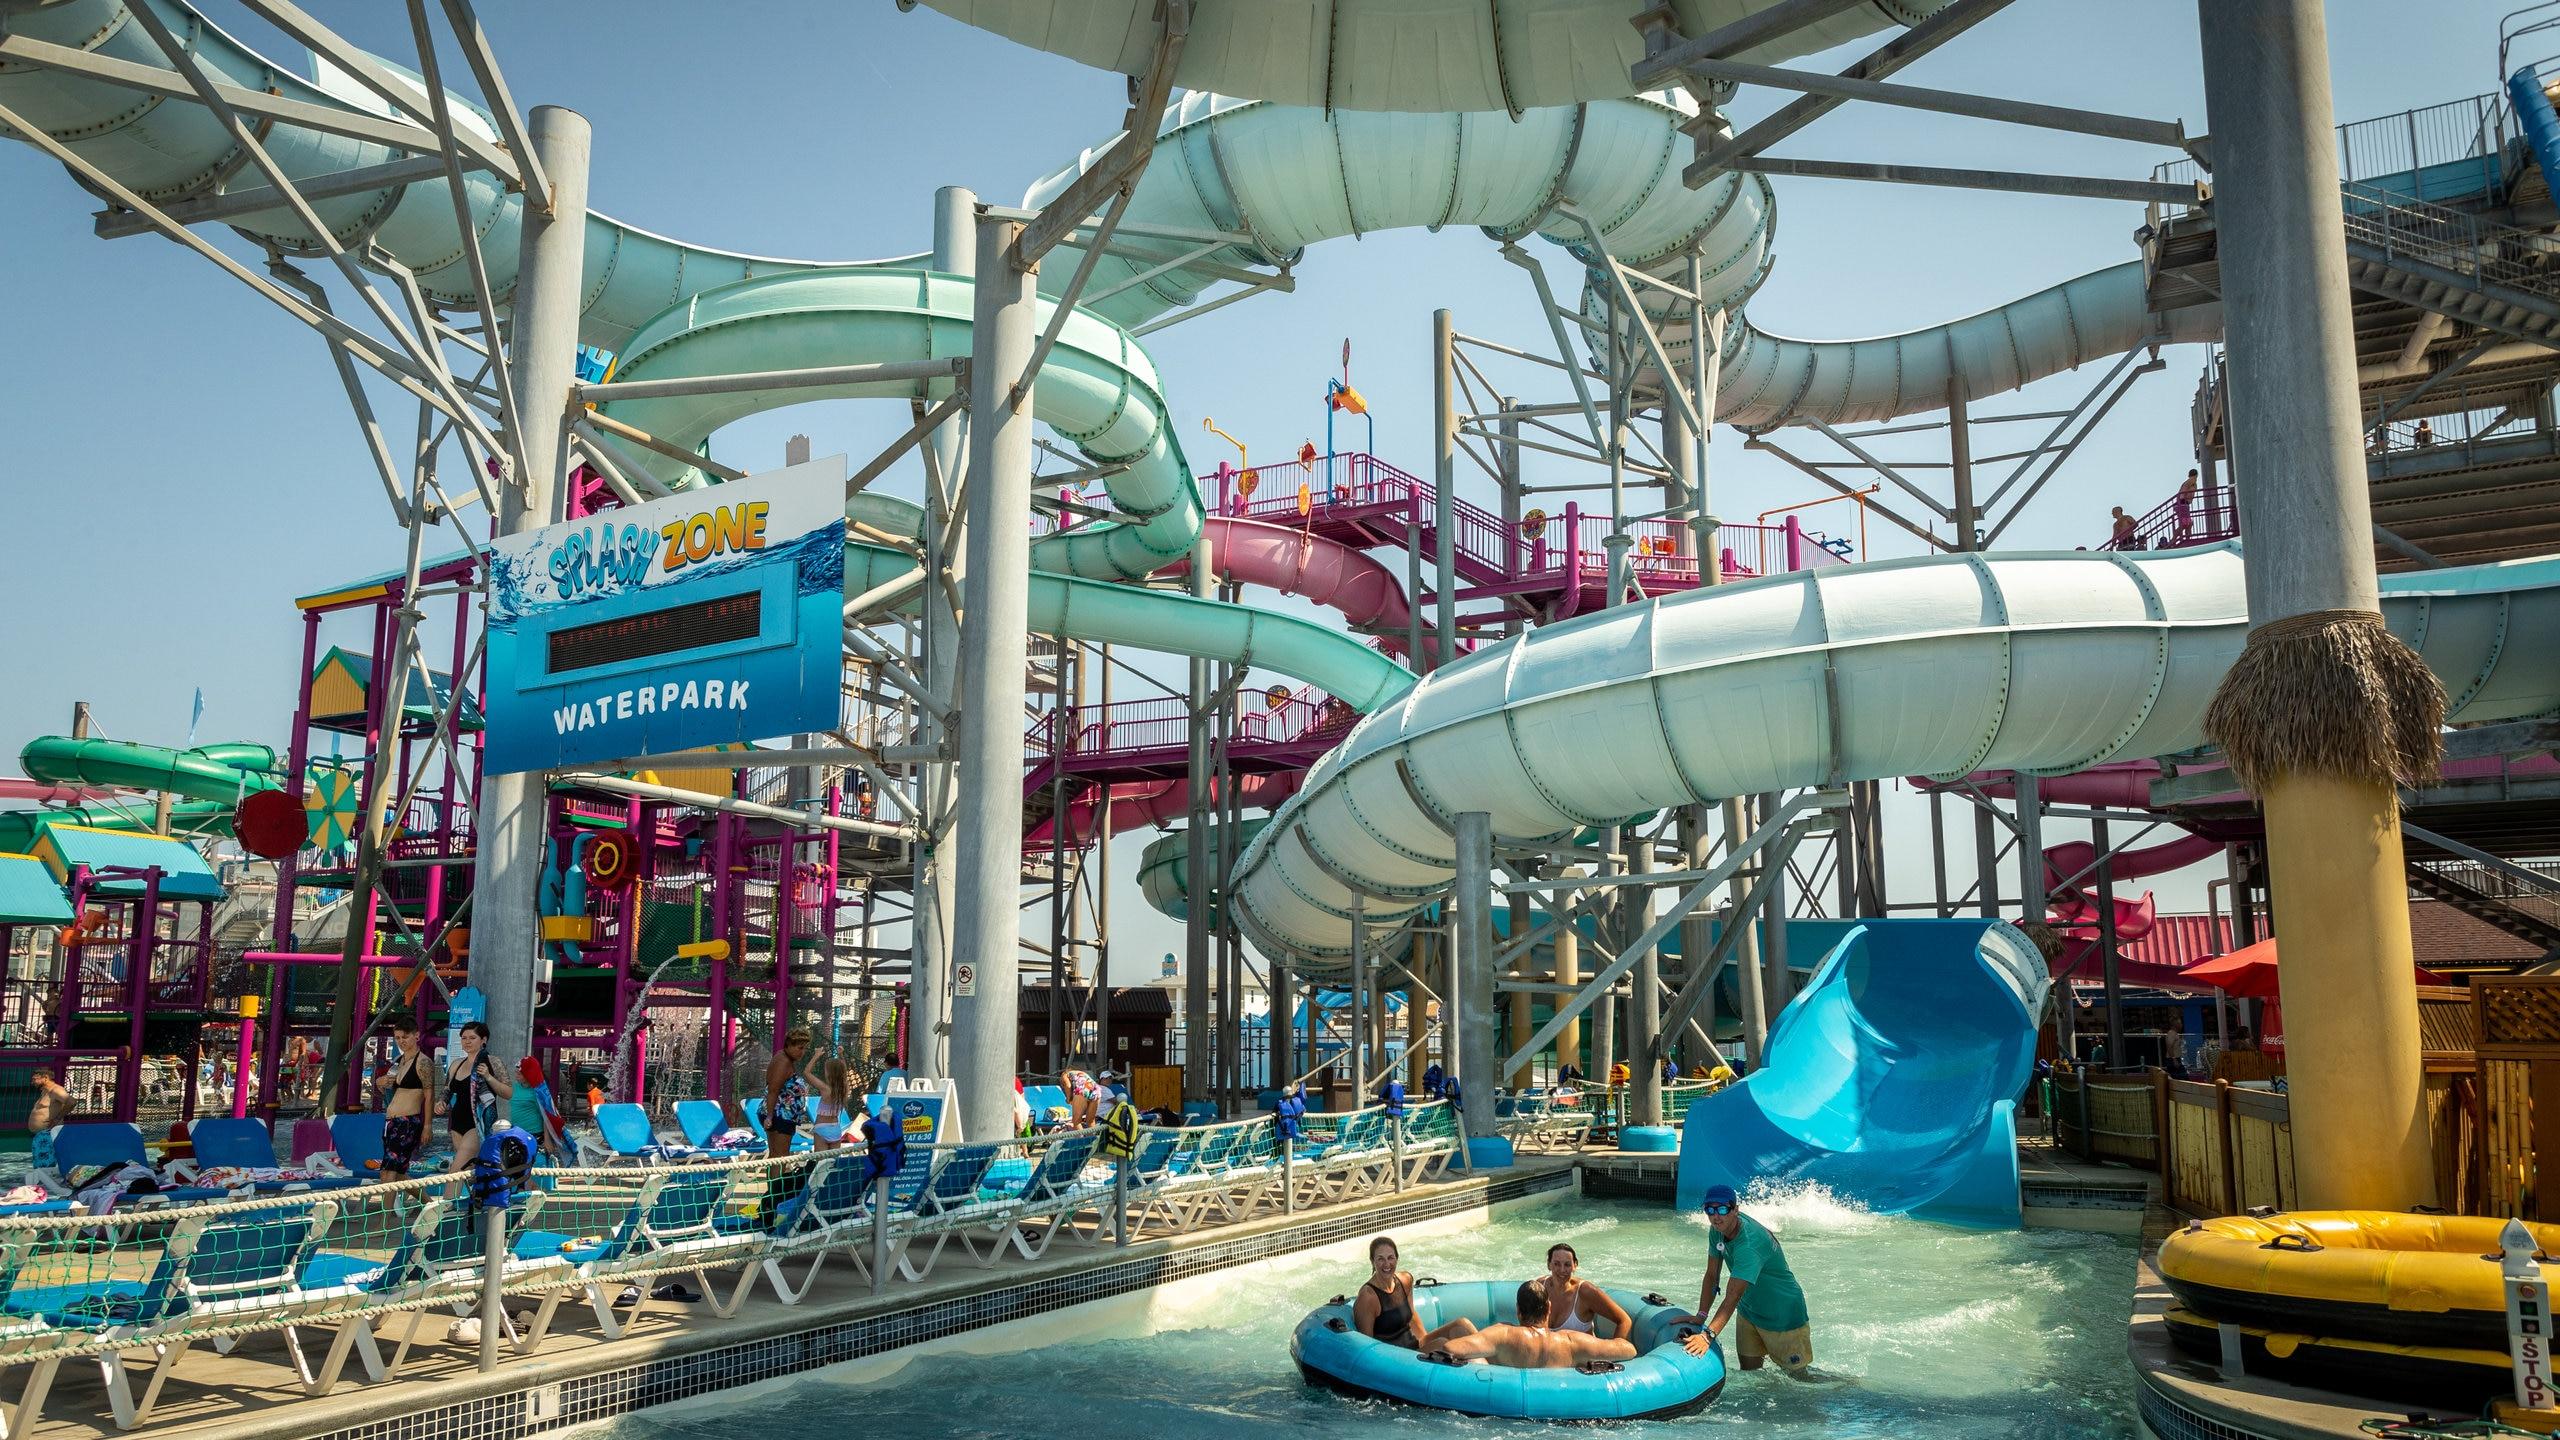 Splash Zone Water Park, Wildwood, New Jersey, United States of America